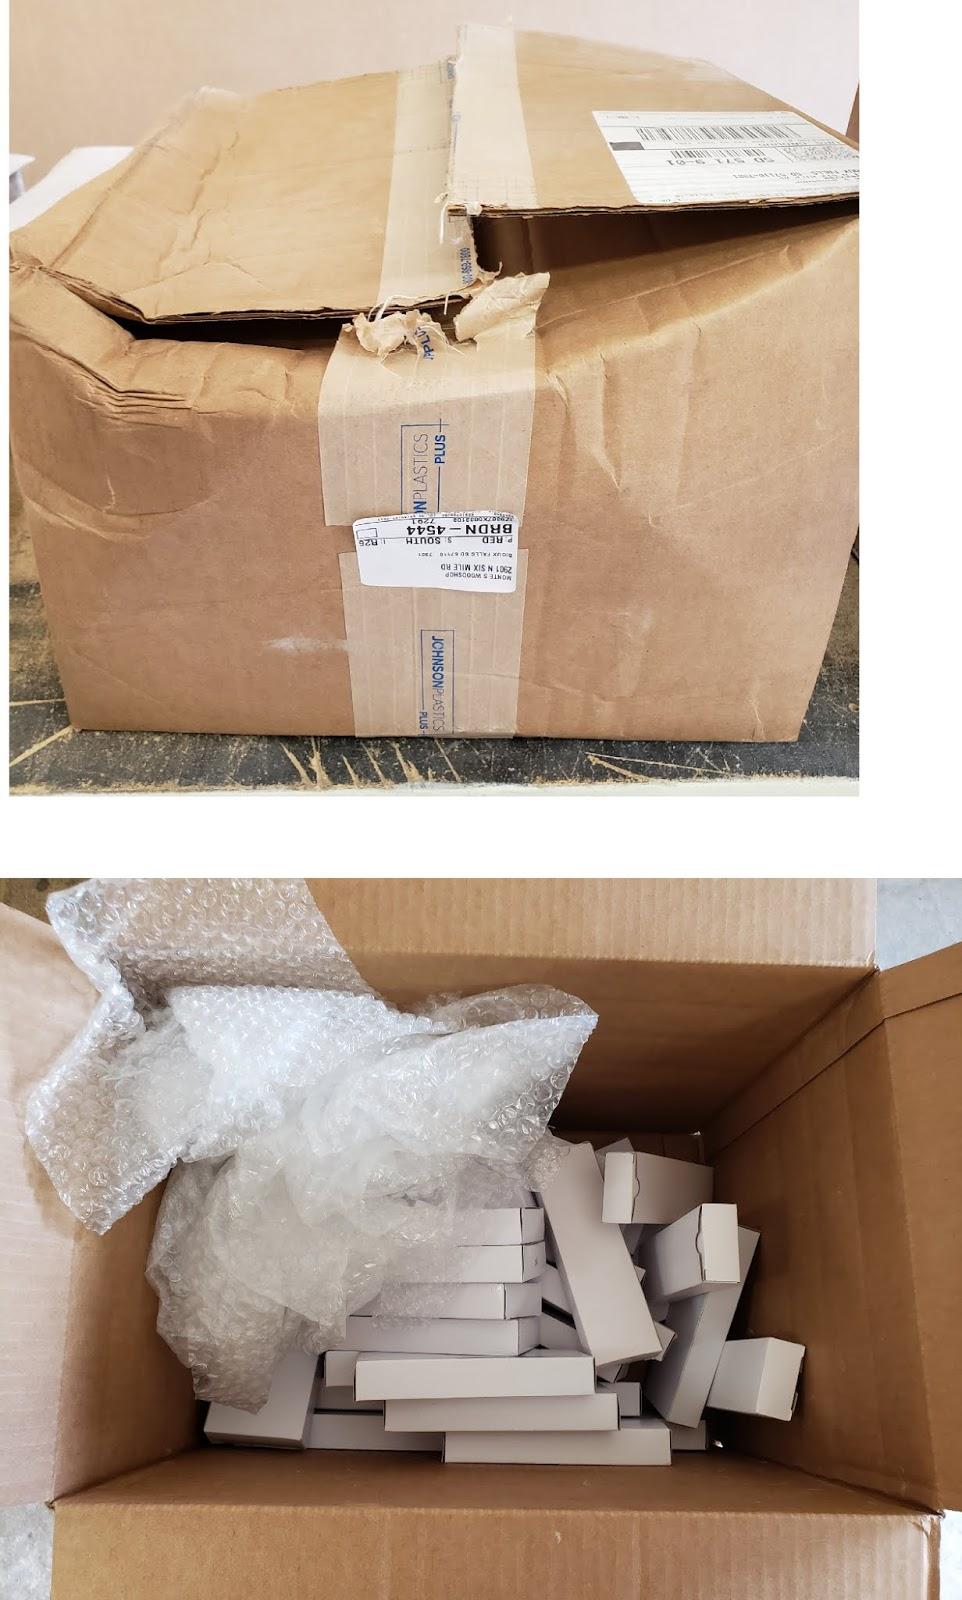 Johnson Plastics Plus - Headquarters - store    Photo 1 of 2   Address: 12450 Oliver Ave South, Suite 100, Burnsville, MN 55337, USA   Phone: (800) 869-7800